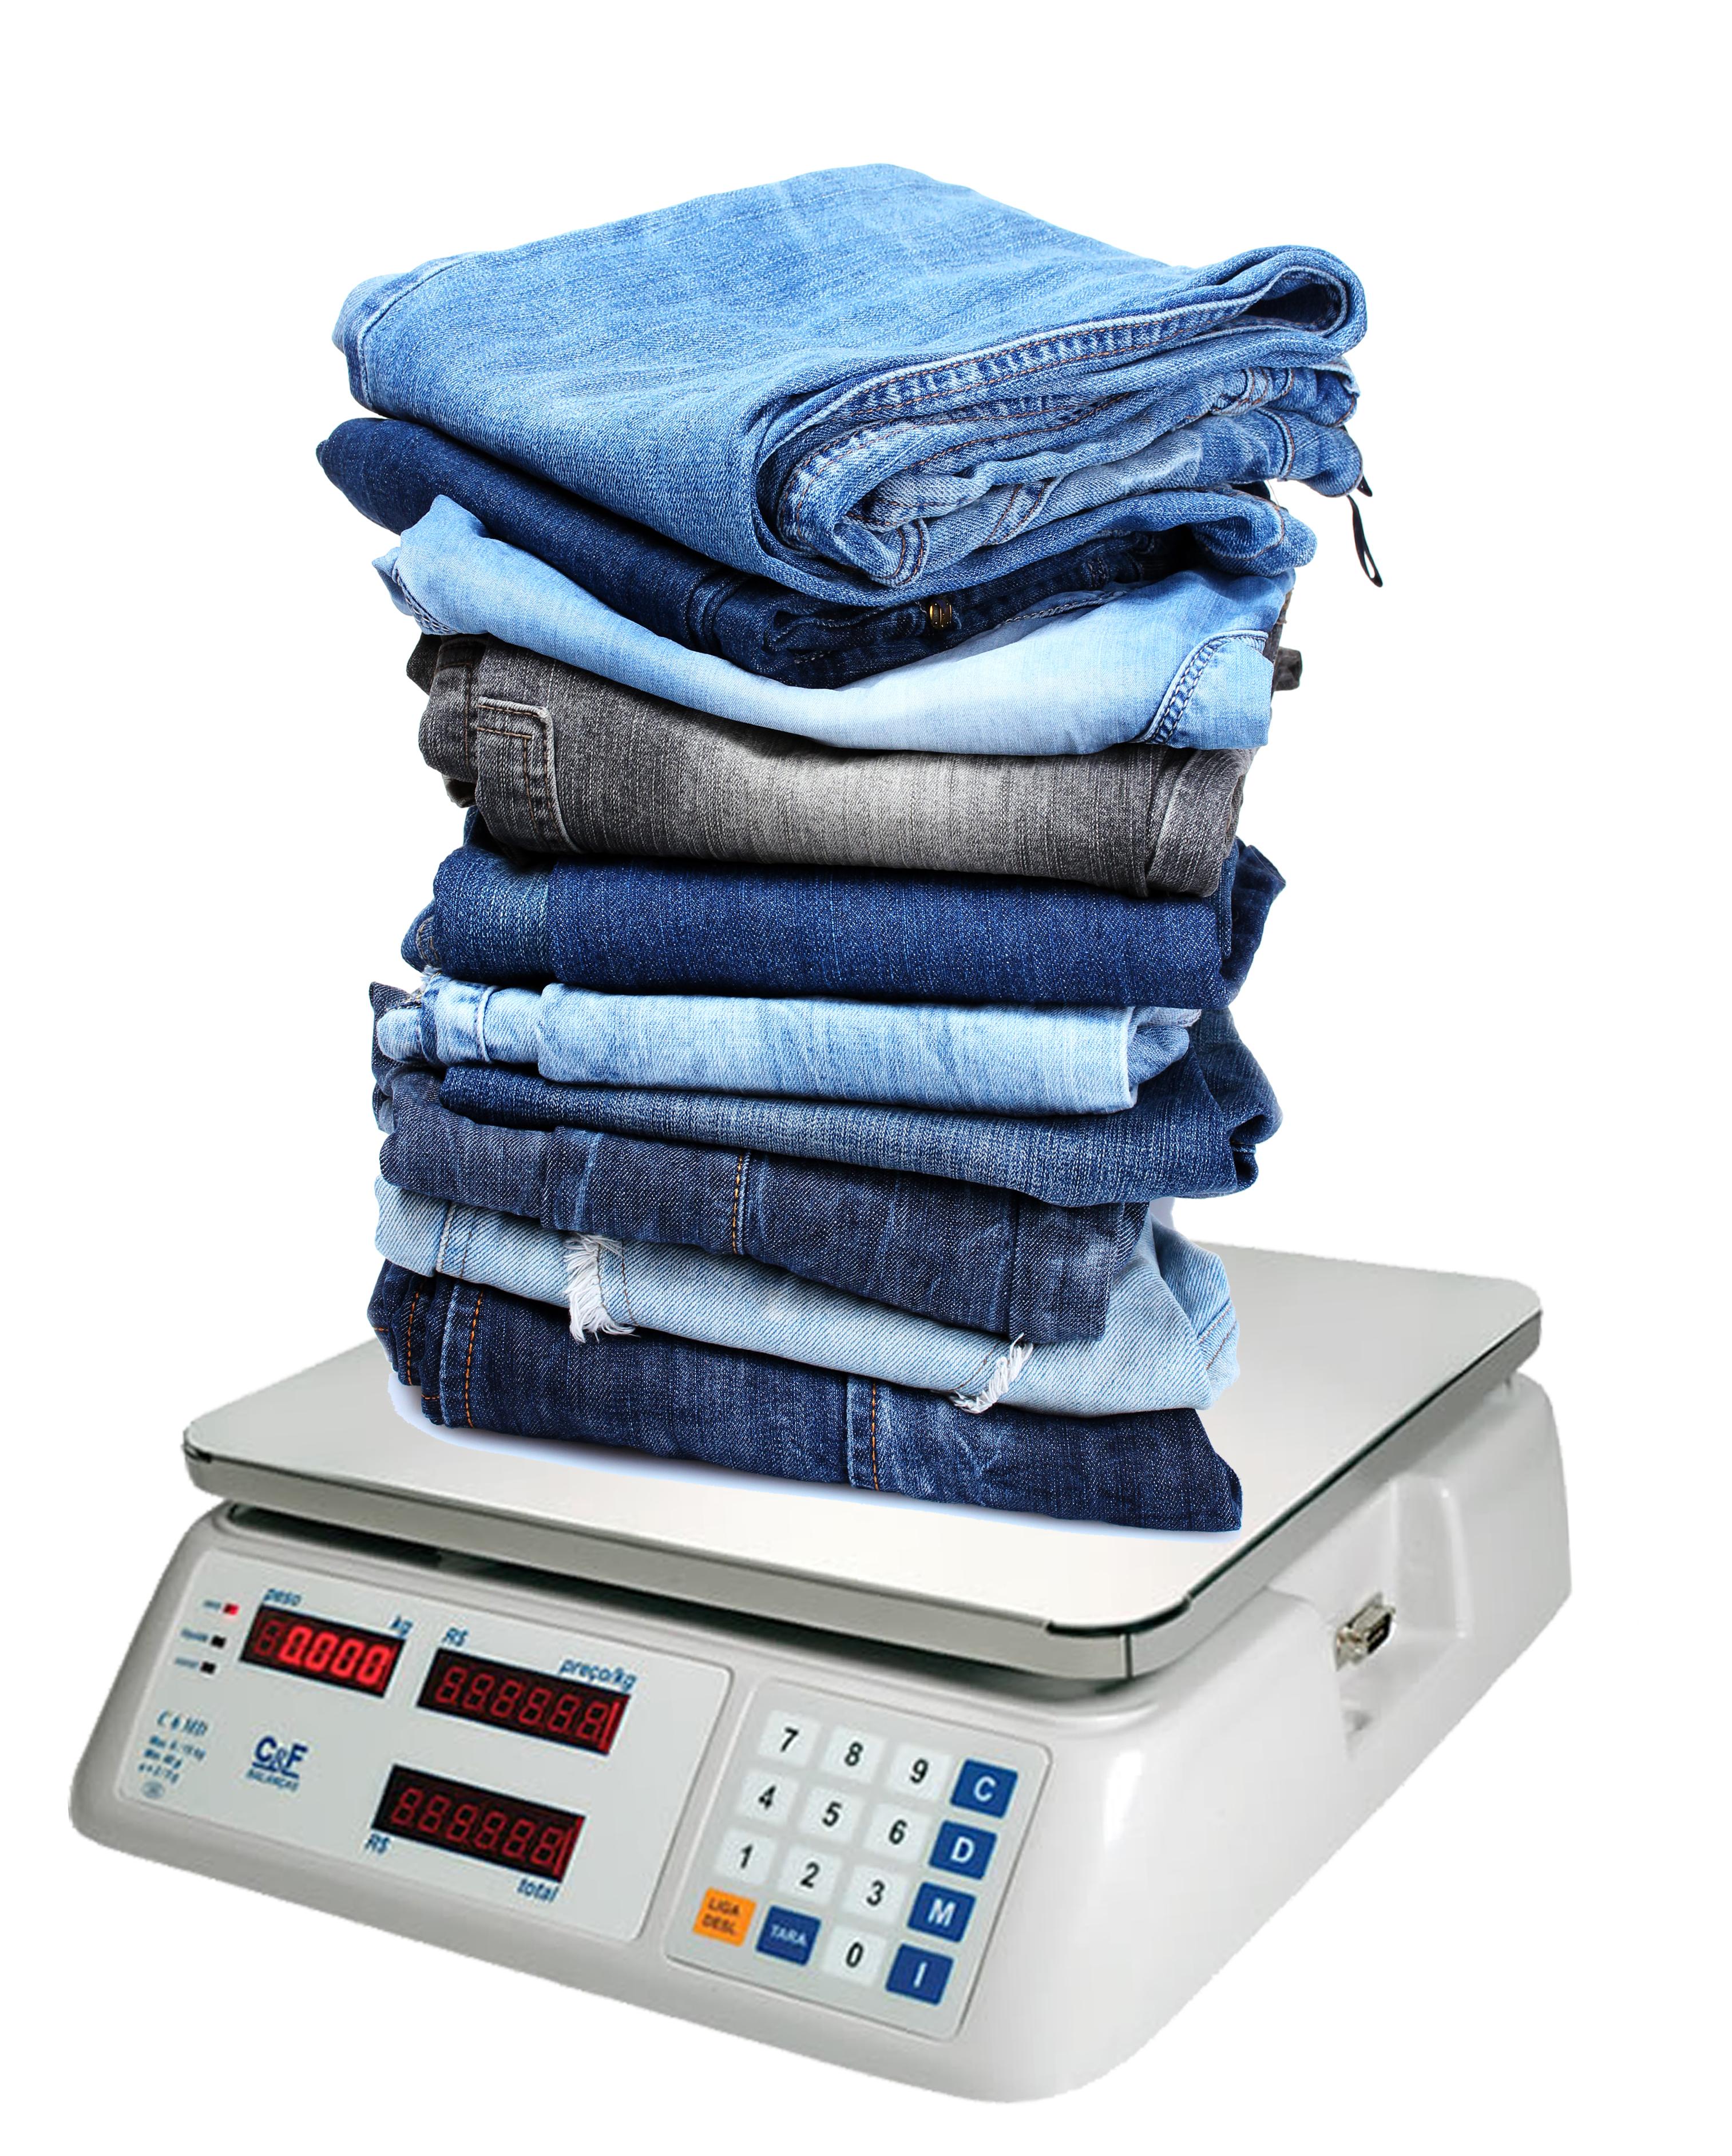 a9e30ee237 Peso das roupas – TODA SUA ROUPA